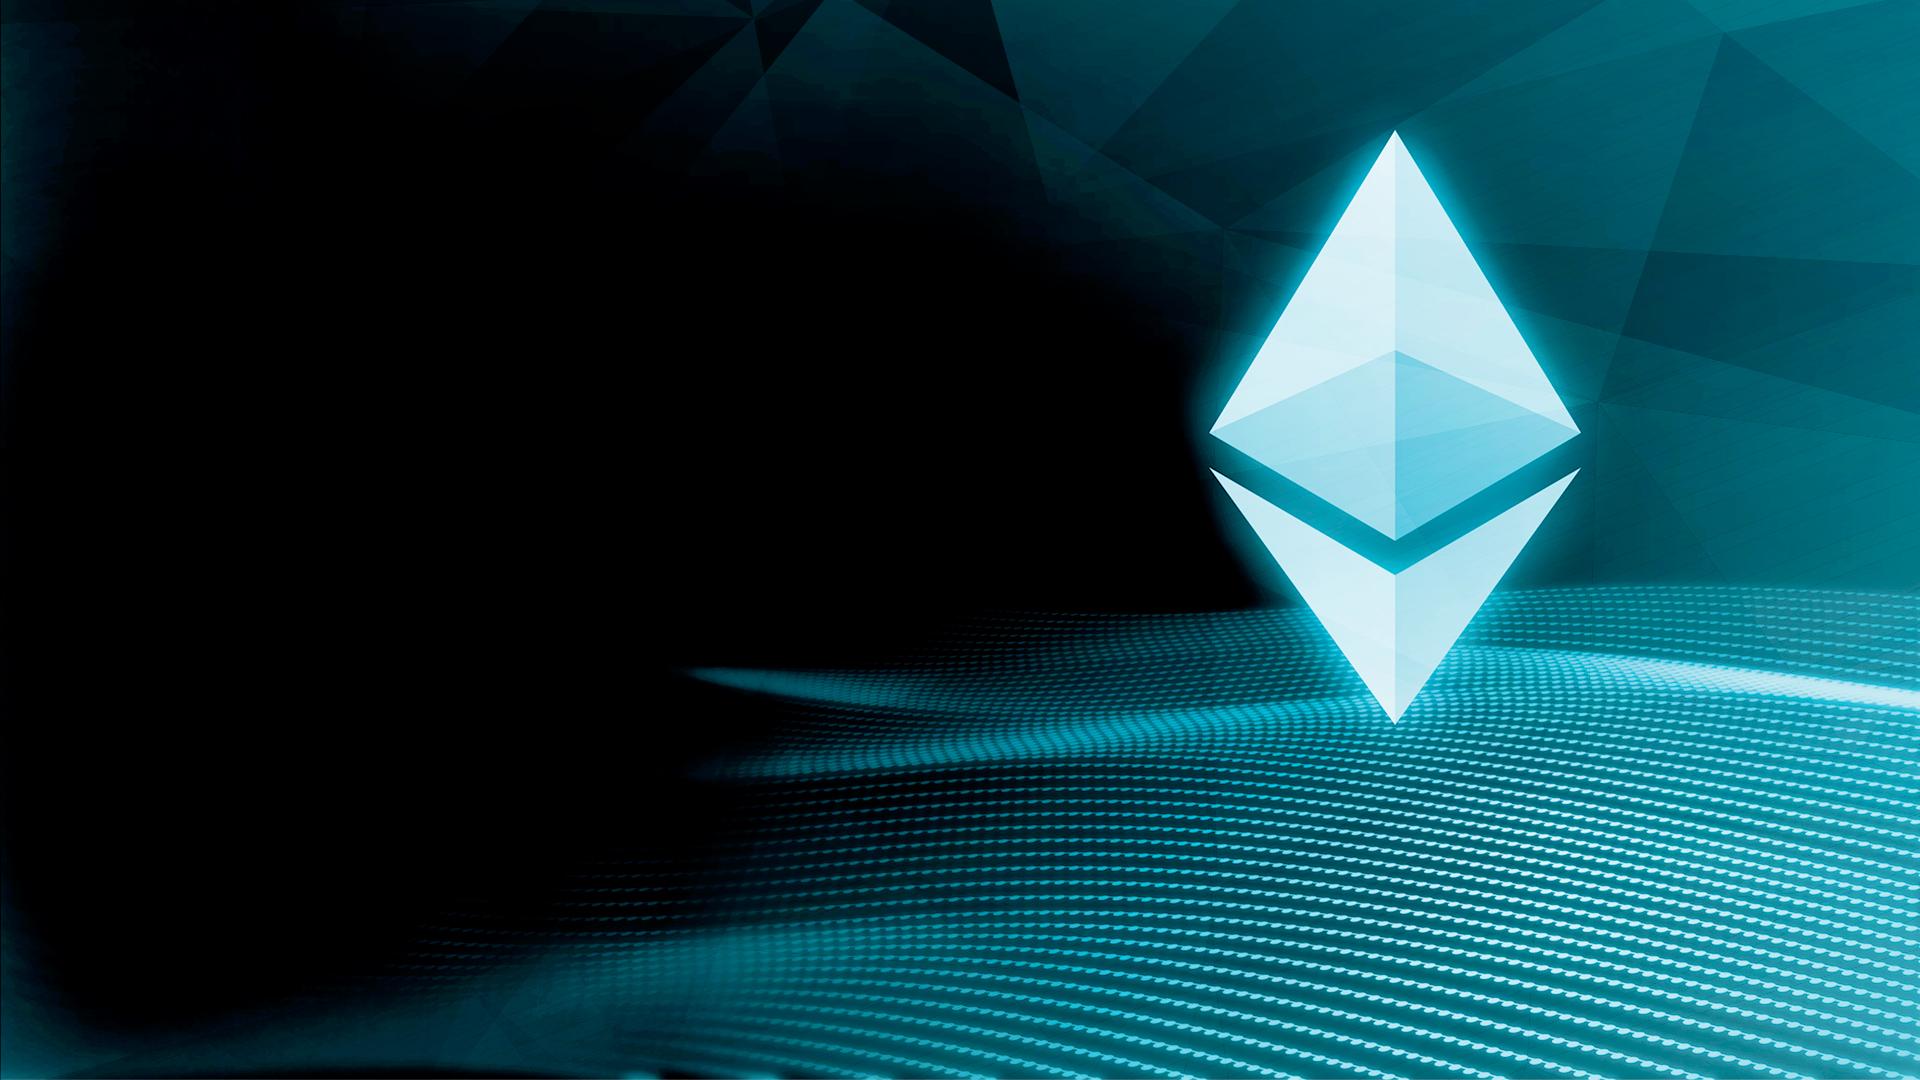 Geld, Kryptowährung, Währung, Crypto-Währung, Wallet, virtuelle Währung, Krypto, Ethereum, Crypto, Kryptocoins, Krypto-Börse, Cryptowährung, Coin, Coins, Kryptowährungen, Kryptowährungsbrieftasche, Ether, ETH